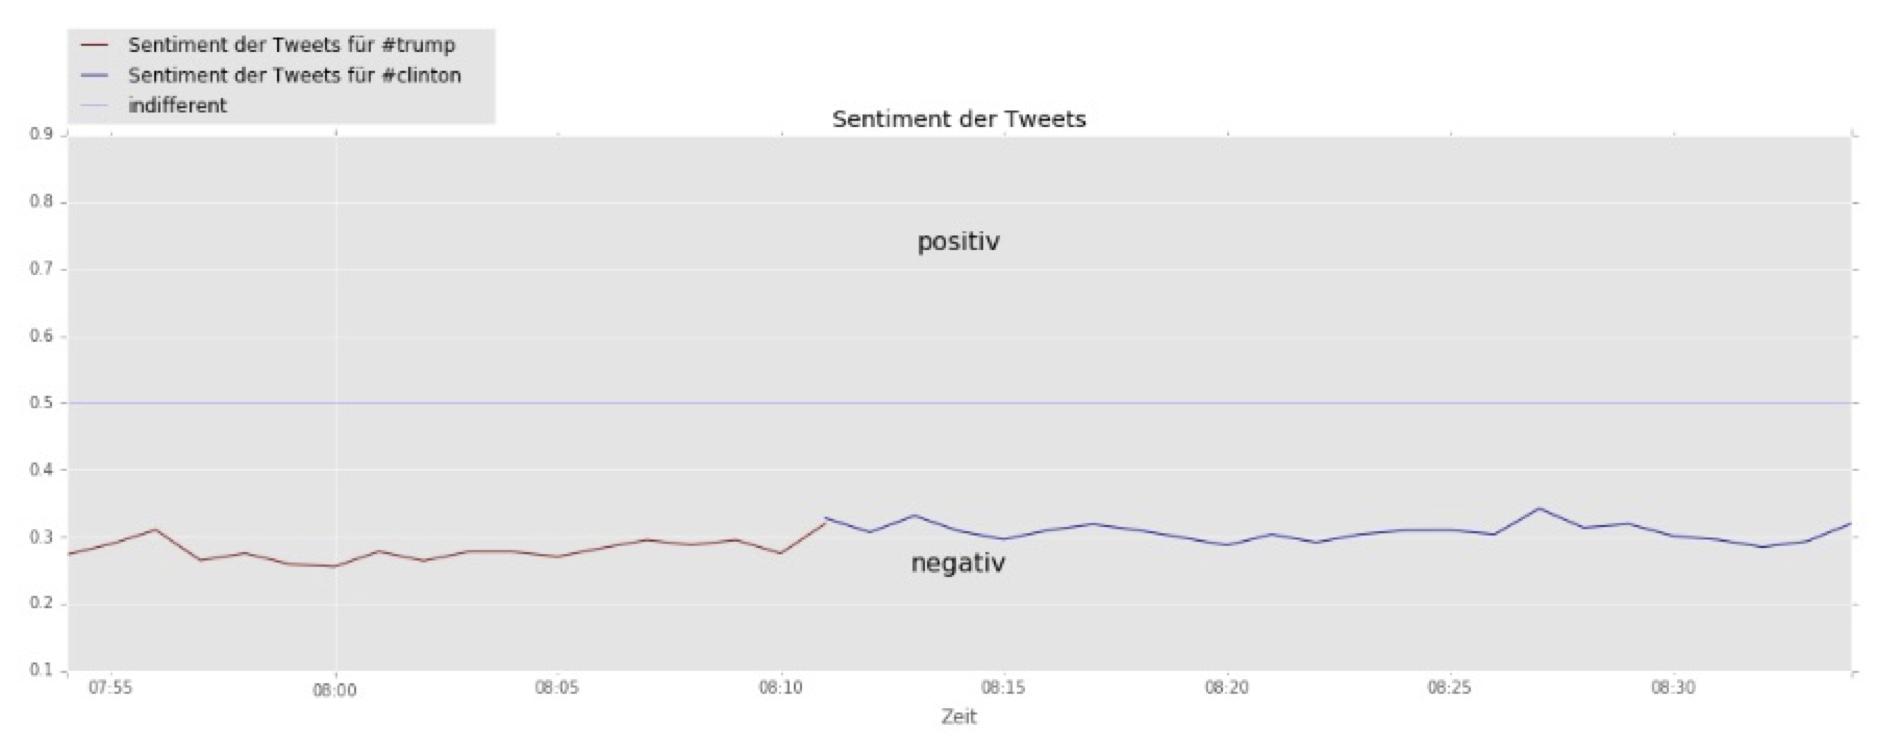 Sentimentanalyse nach der US-Wahl #trump vs. #clinton - wengerekConsulting